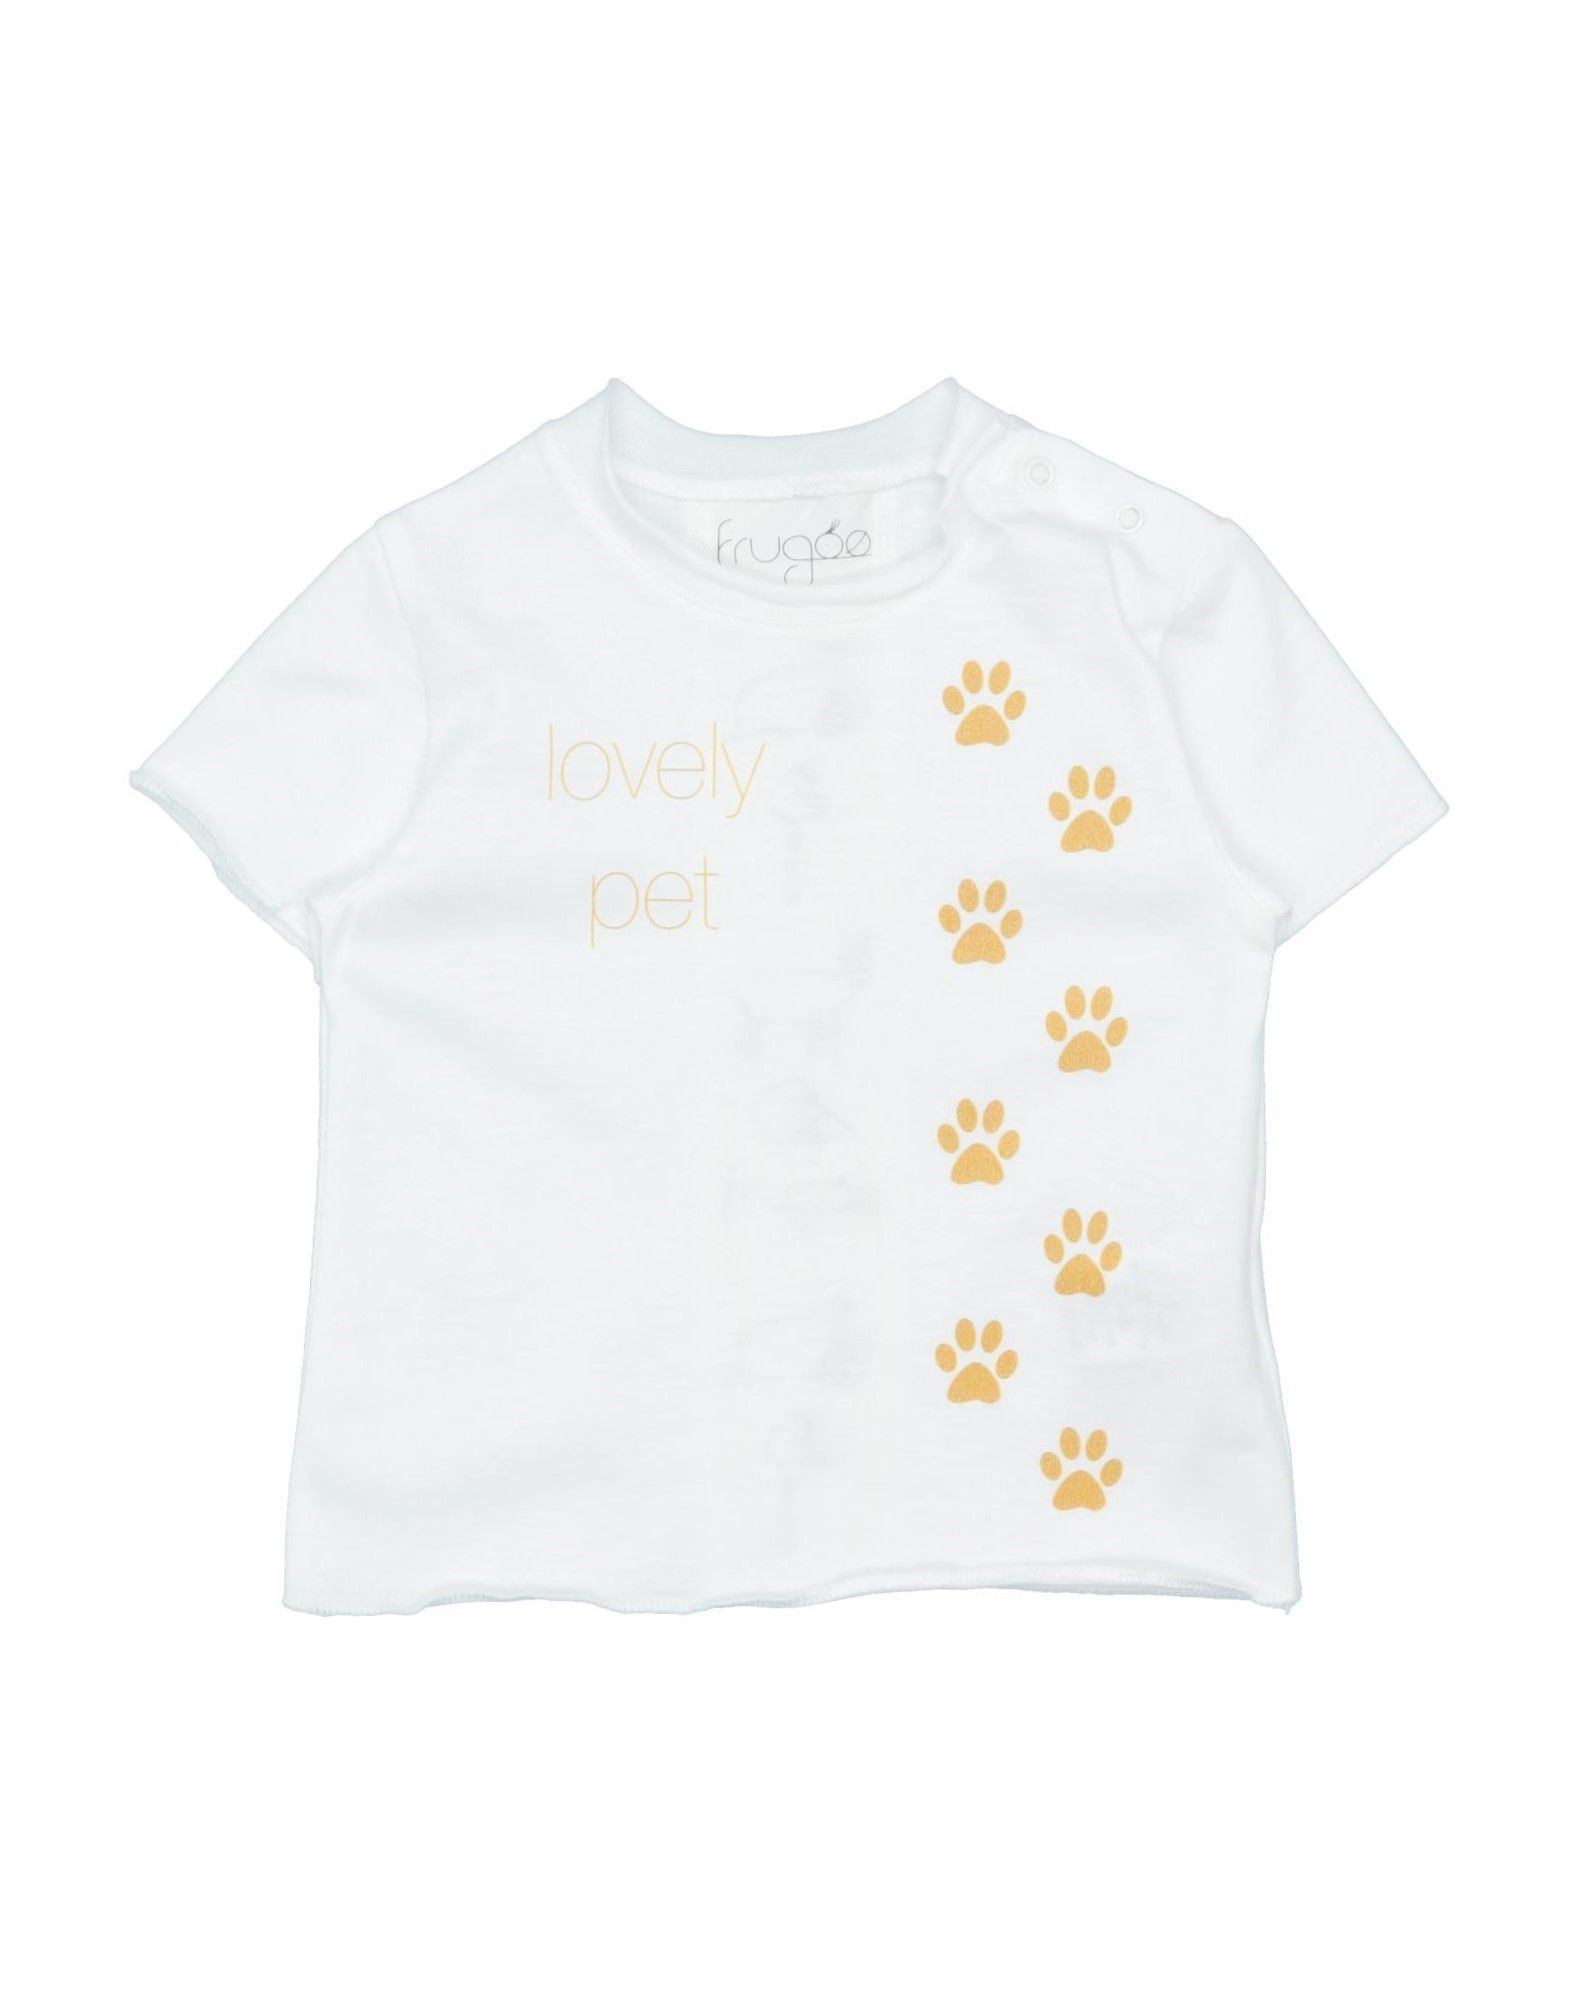 Frugoo Kids' T-shirts In White